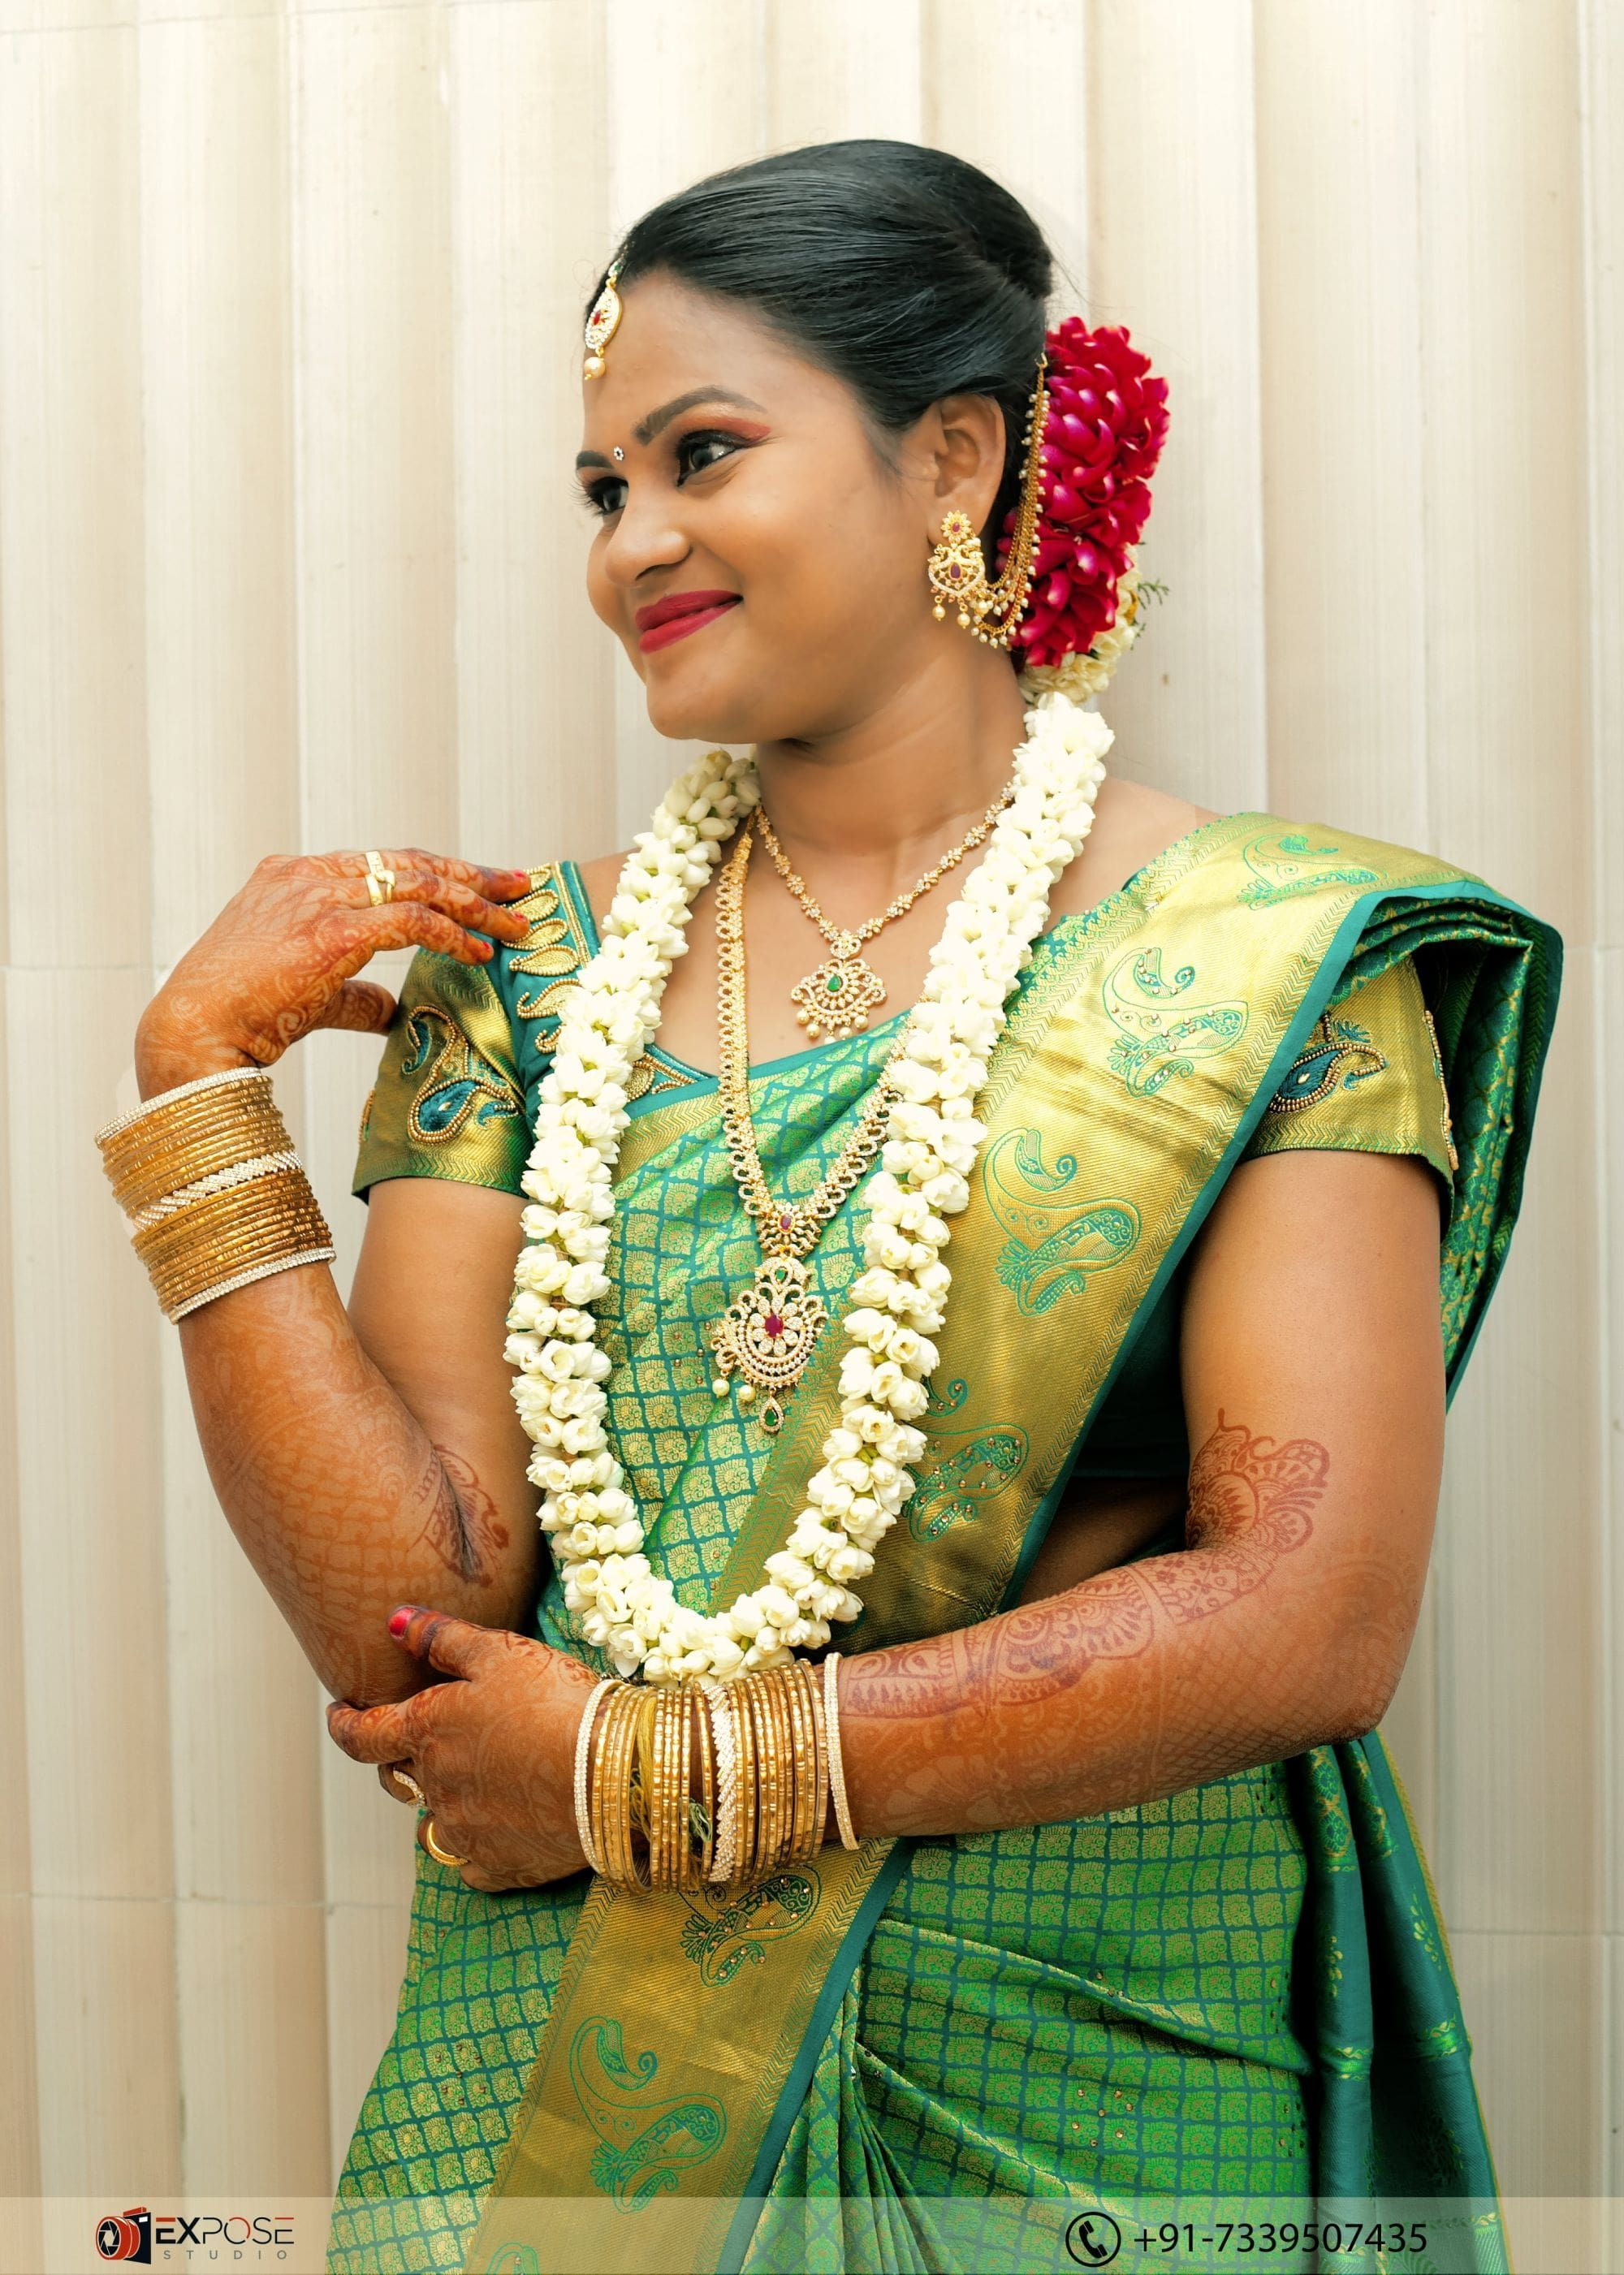 Tamil Traditional Wedding Traditional wedding, South